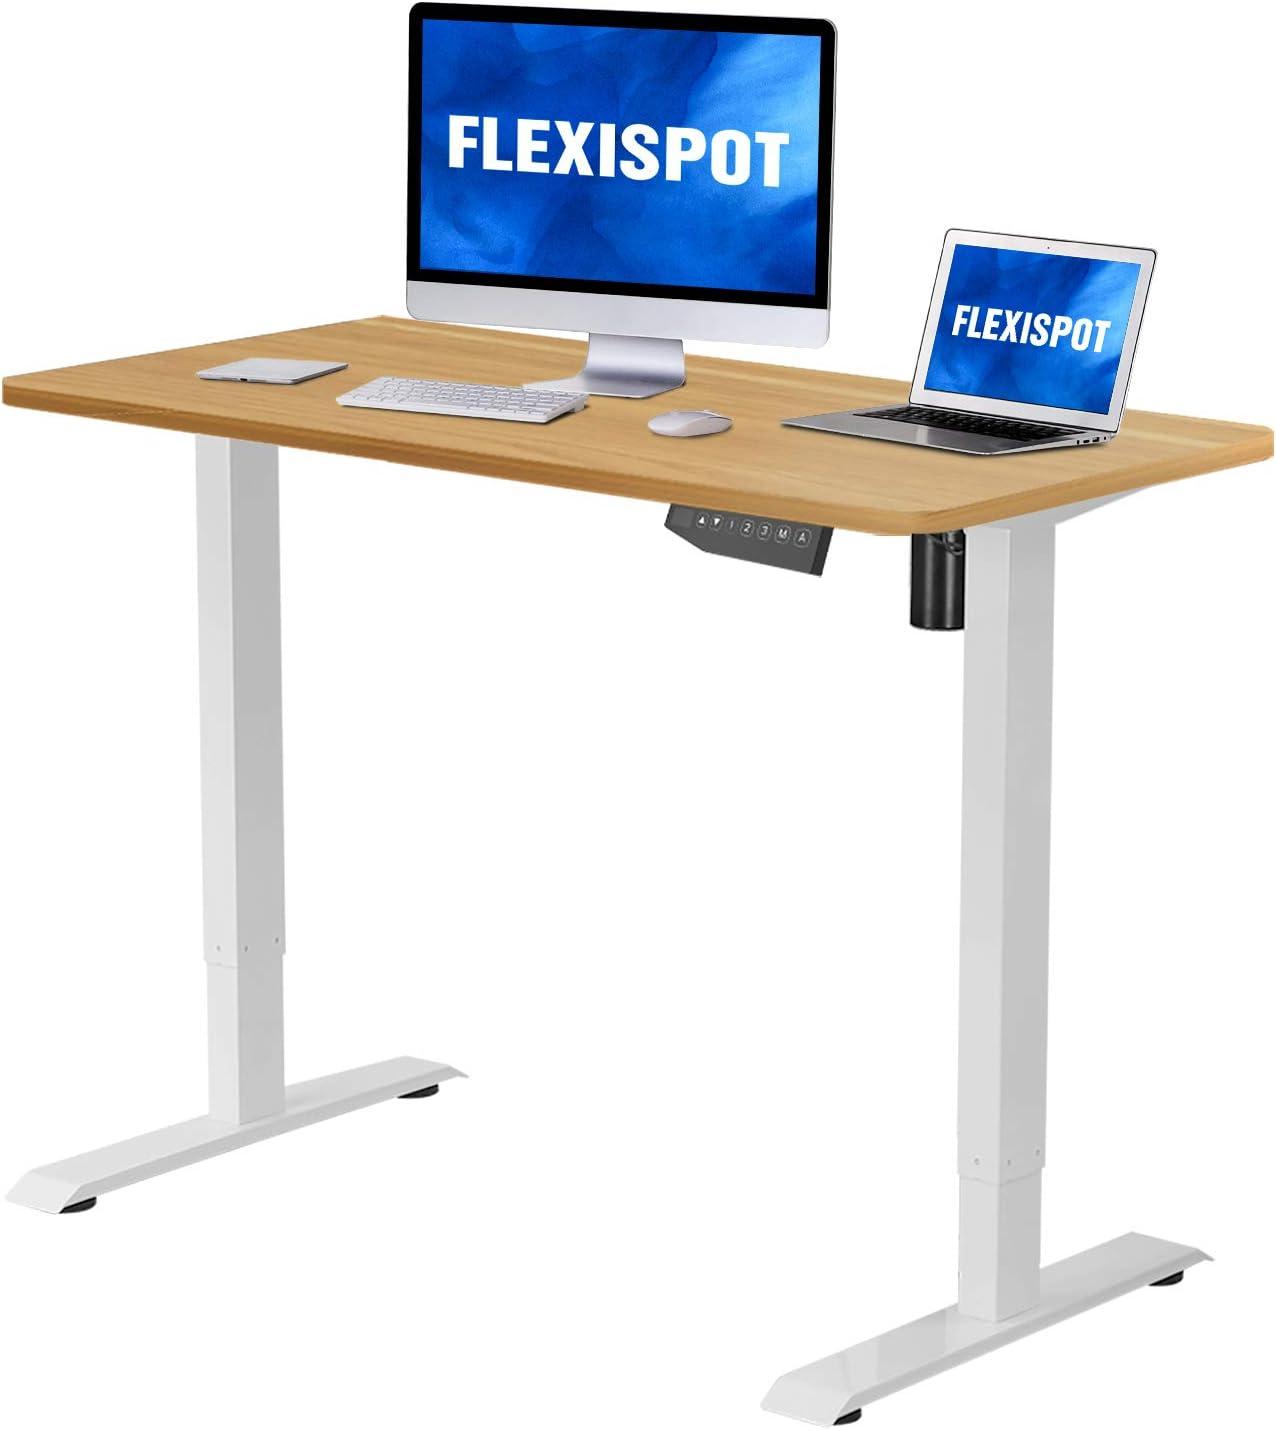 Flexispot Electric Stand Up Desk Workstation with Desktop 42 x 24 Inches Whole-Piece Desk Ergonomic Memory Controller Standing Desk Height Adjustable Black Frame + 42 Black Top